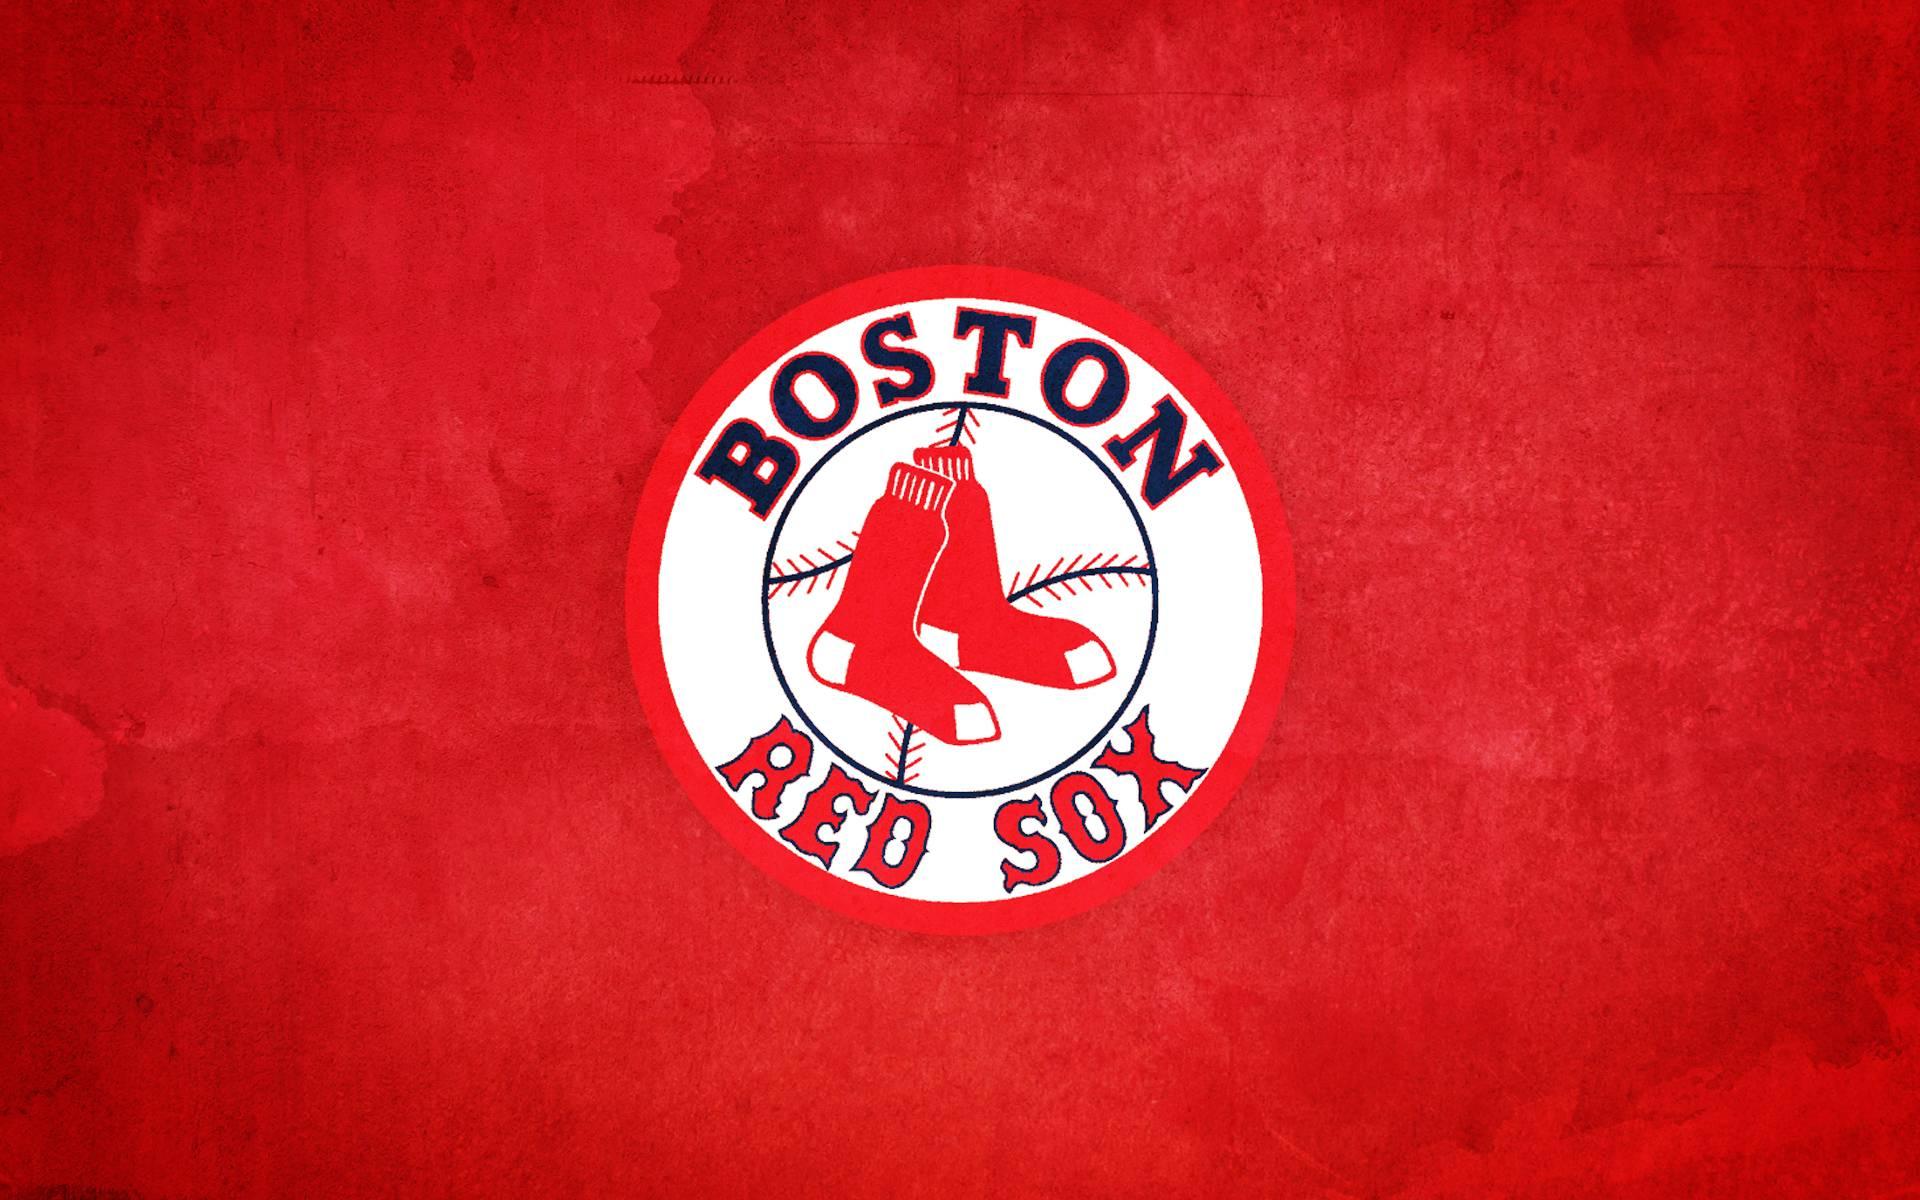 Boston Red Sox Wallpaper 1   1920 X 1200 stmednet 1920x1200